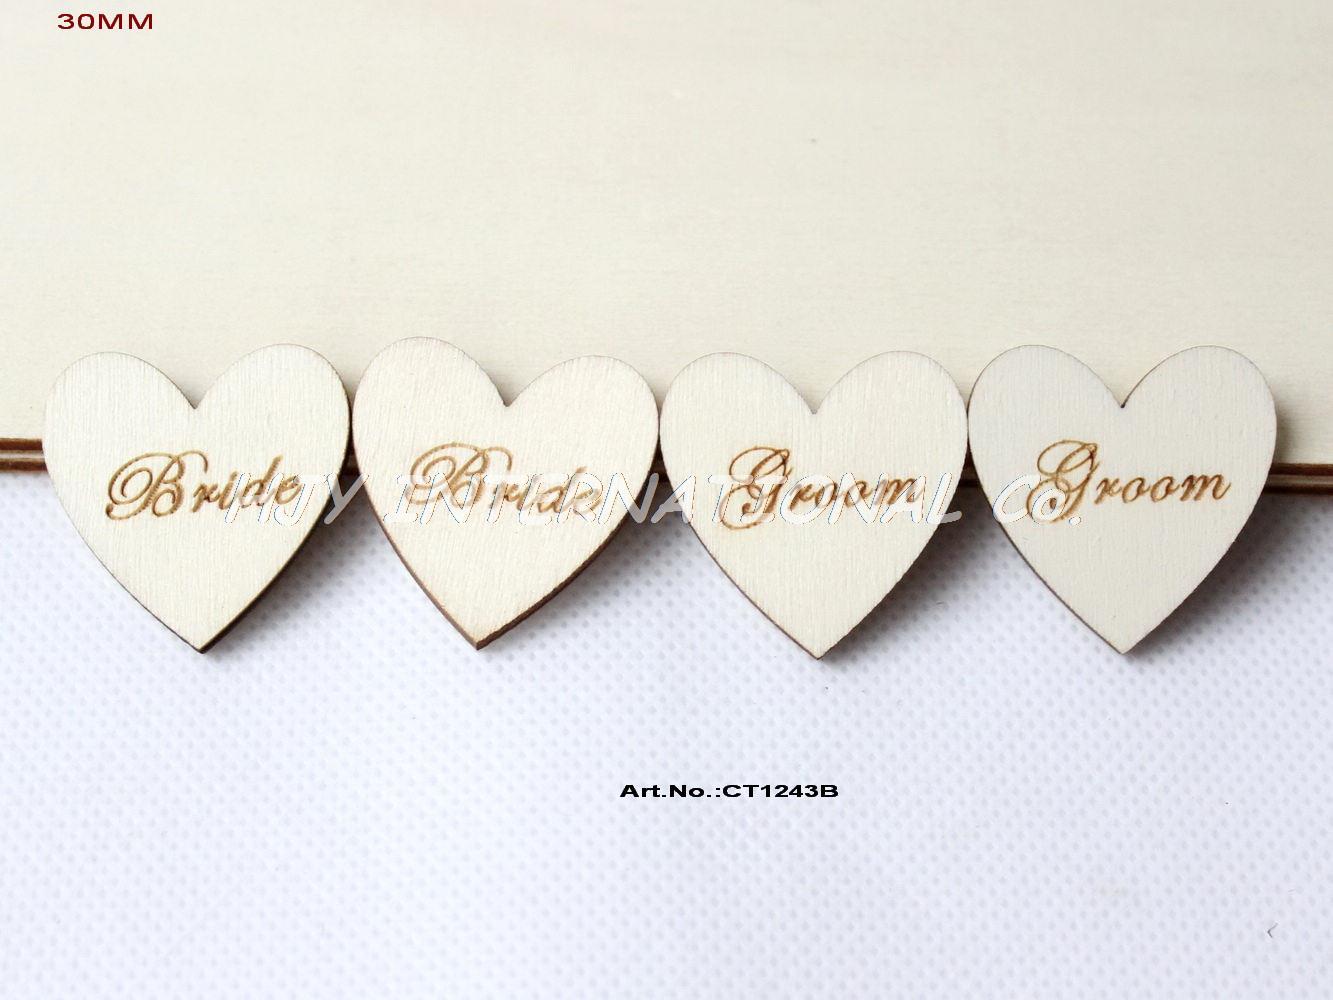 B List Wedding Gift : ... Bride-Groom-Wedding-Hearts-DIY-Wedding-Decor-Gift-Tag-30mm-CT1243B.jpg